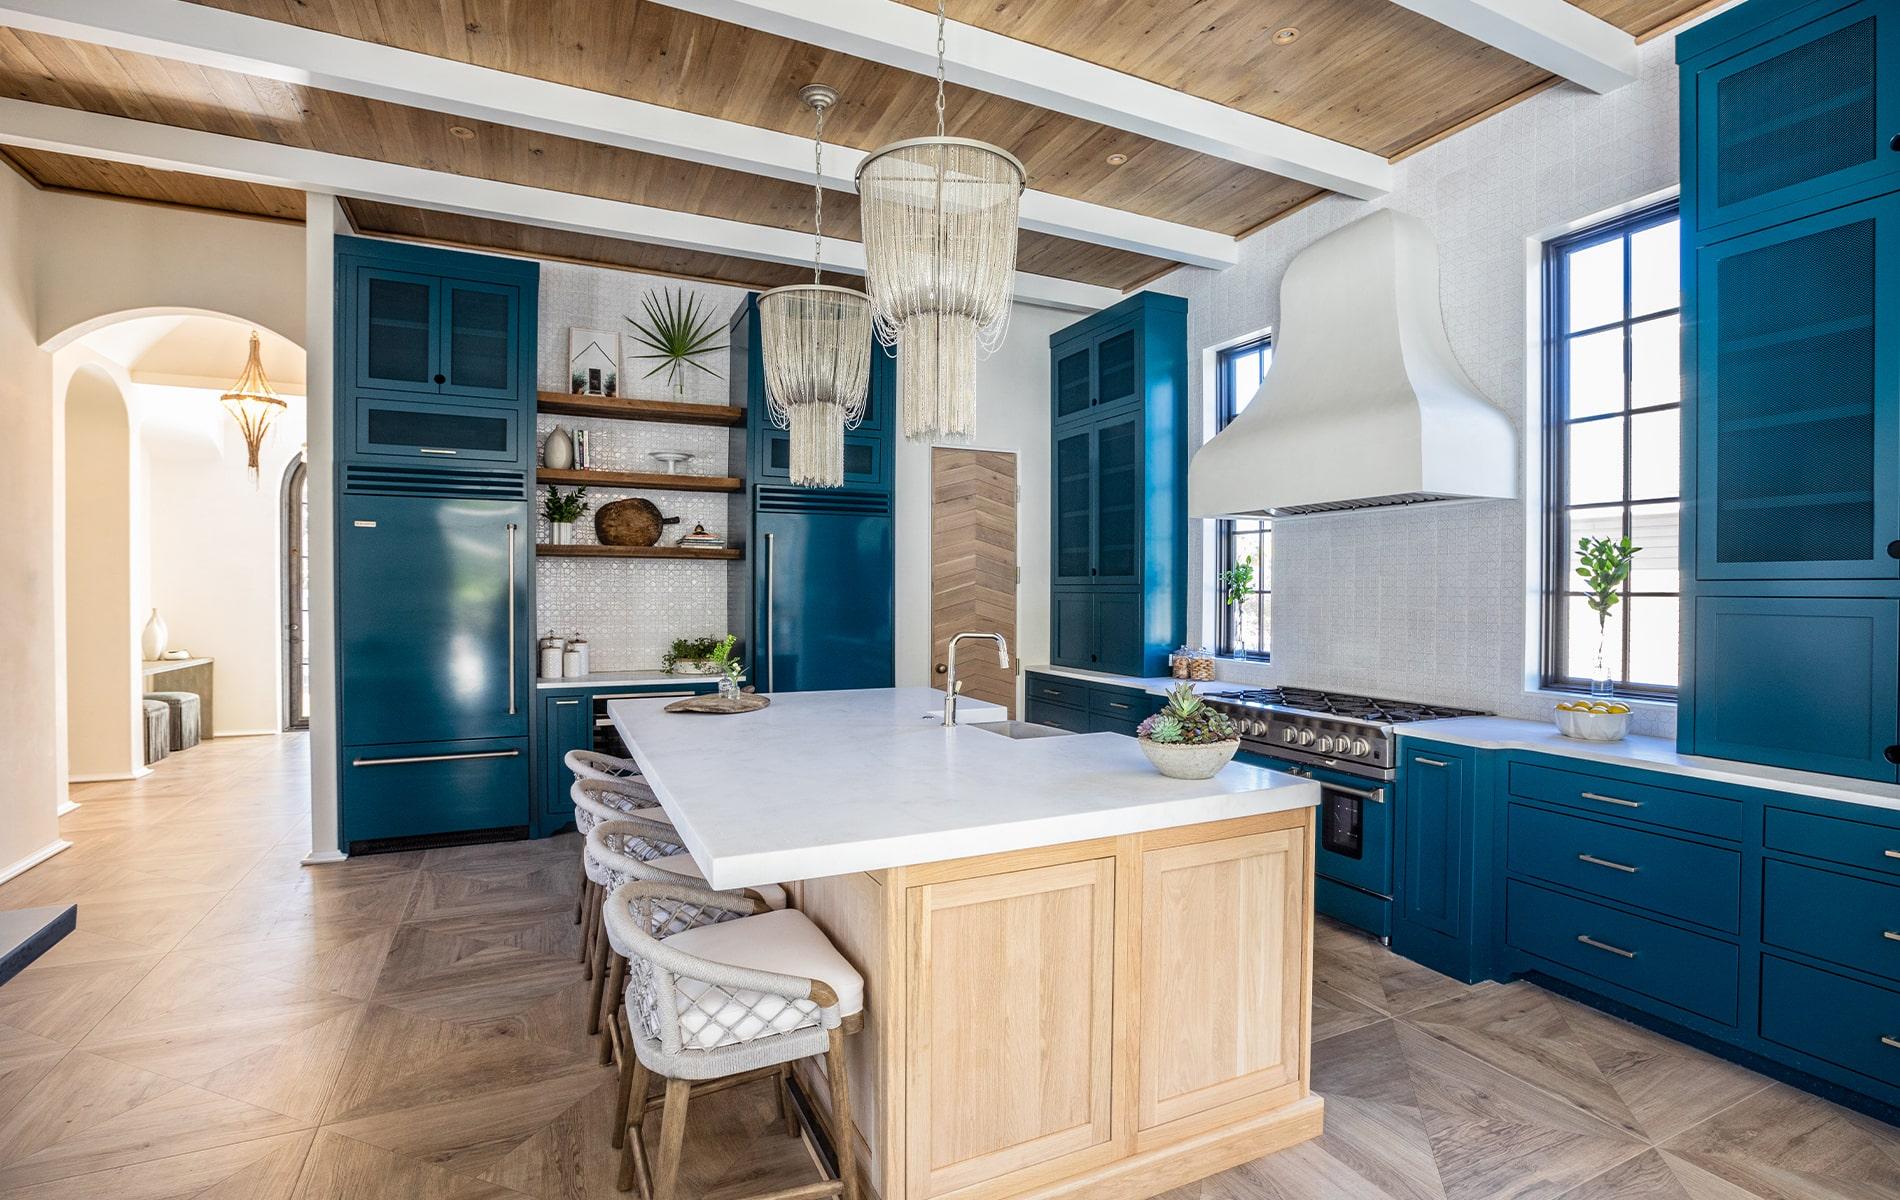 VIE Beach House A Show Home, Cindy McCarley Designs, Q Tile, Coastal Elements Construction